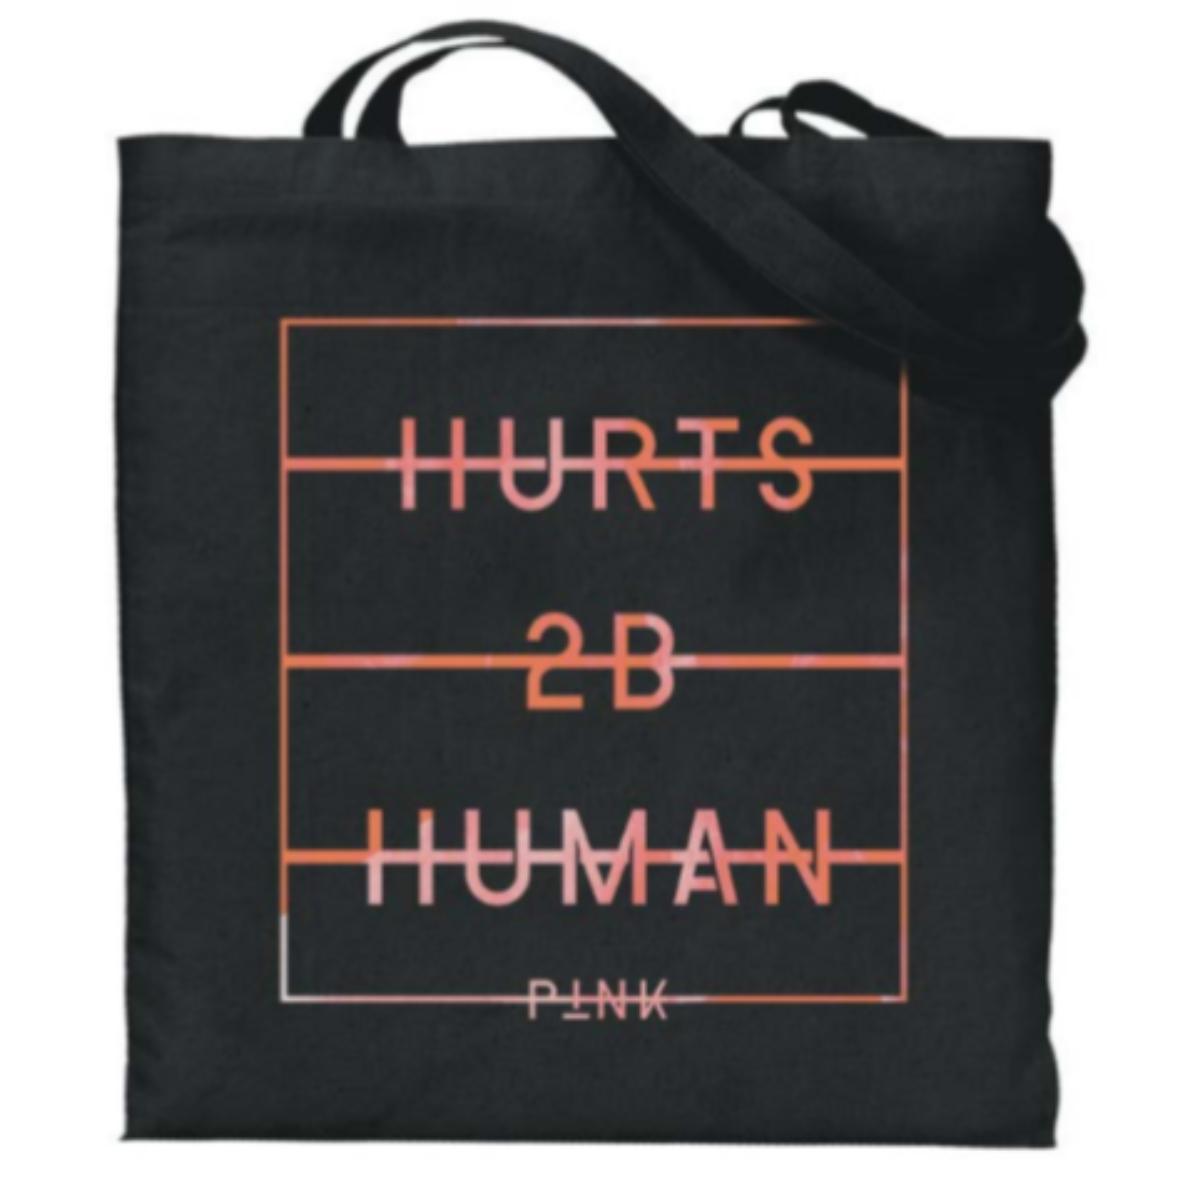 Hurts 2B Human Tote